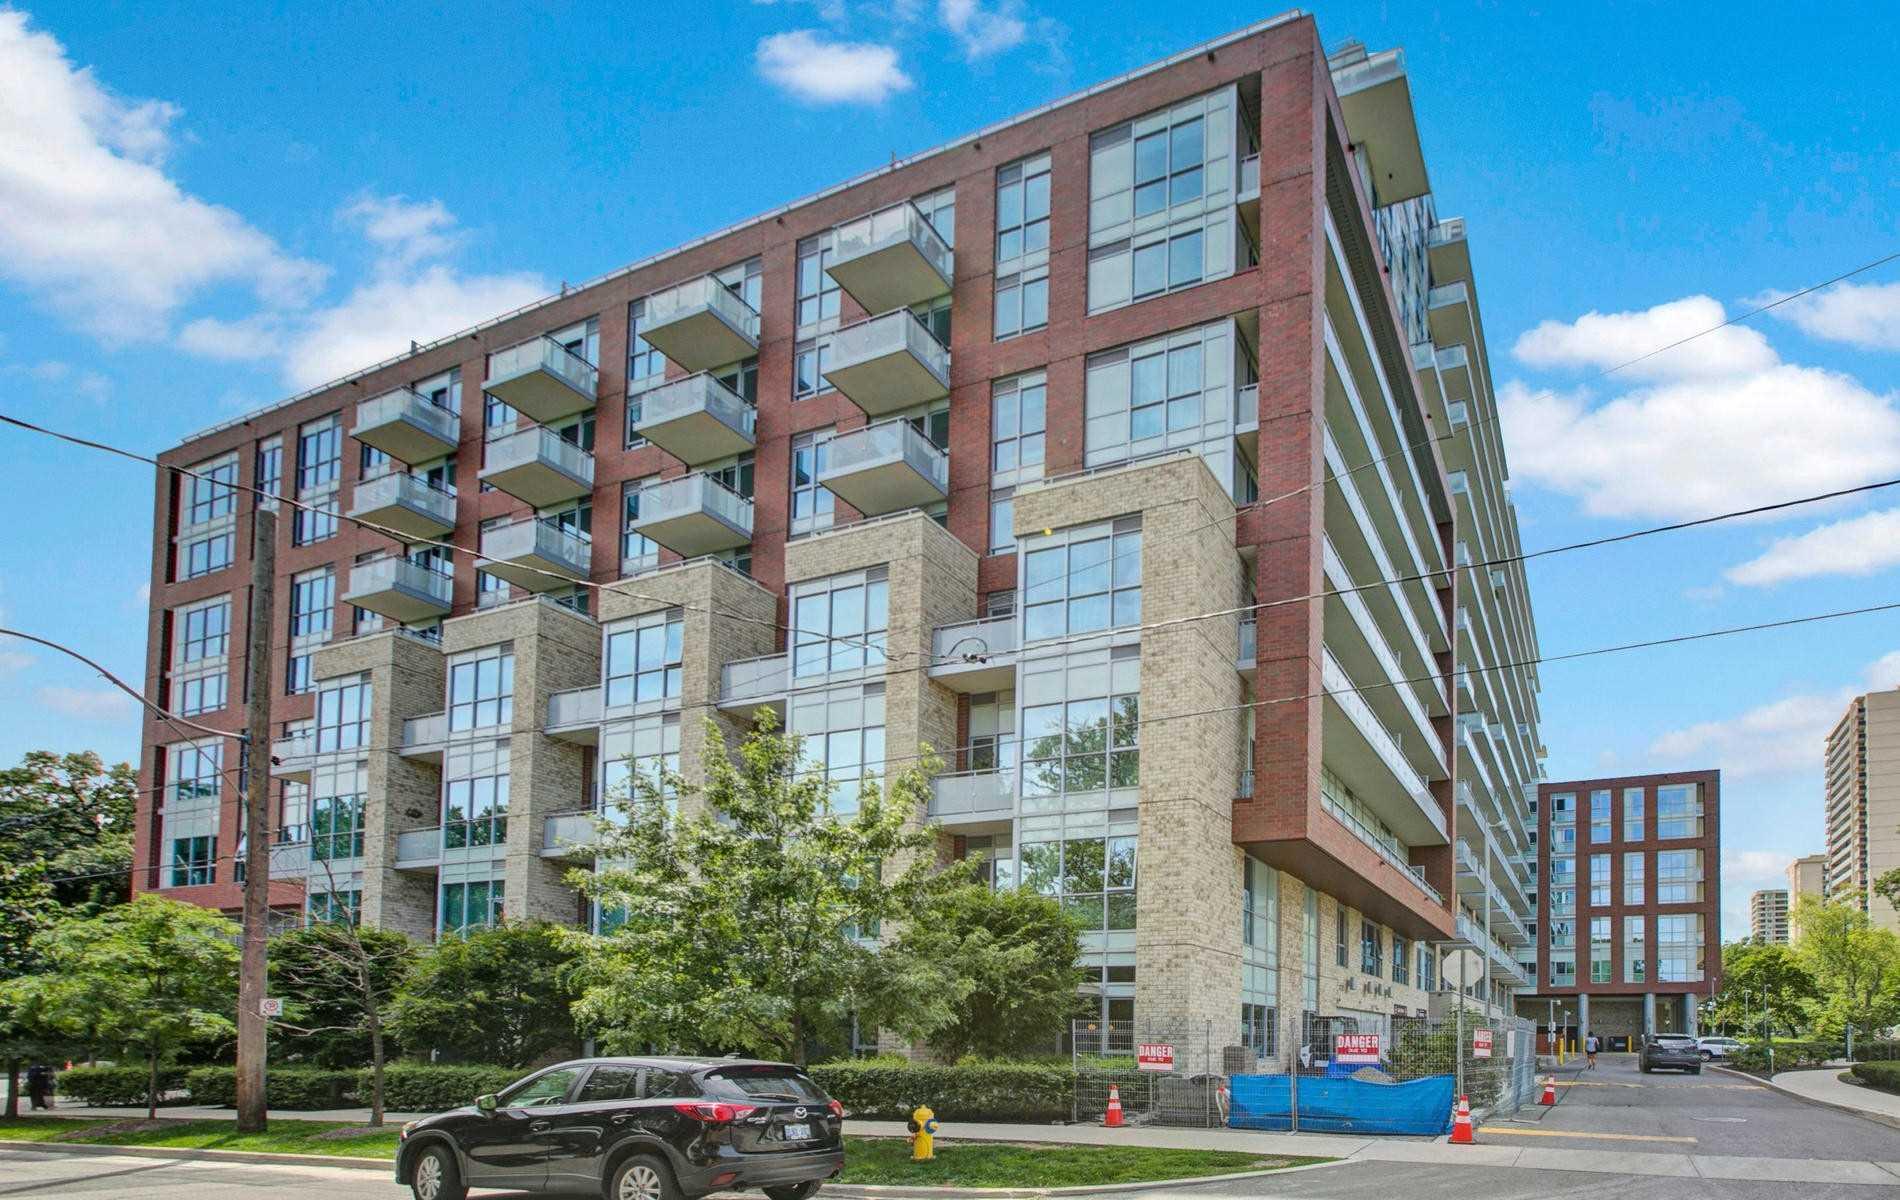 1830 Bloor St, Toronto, Ontario M6P0A2, 4 Rooms Rooms,1 BathroomBathrooms,Condo Apt,For Sale,Bloor,W4917624